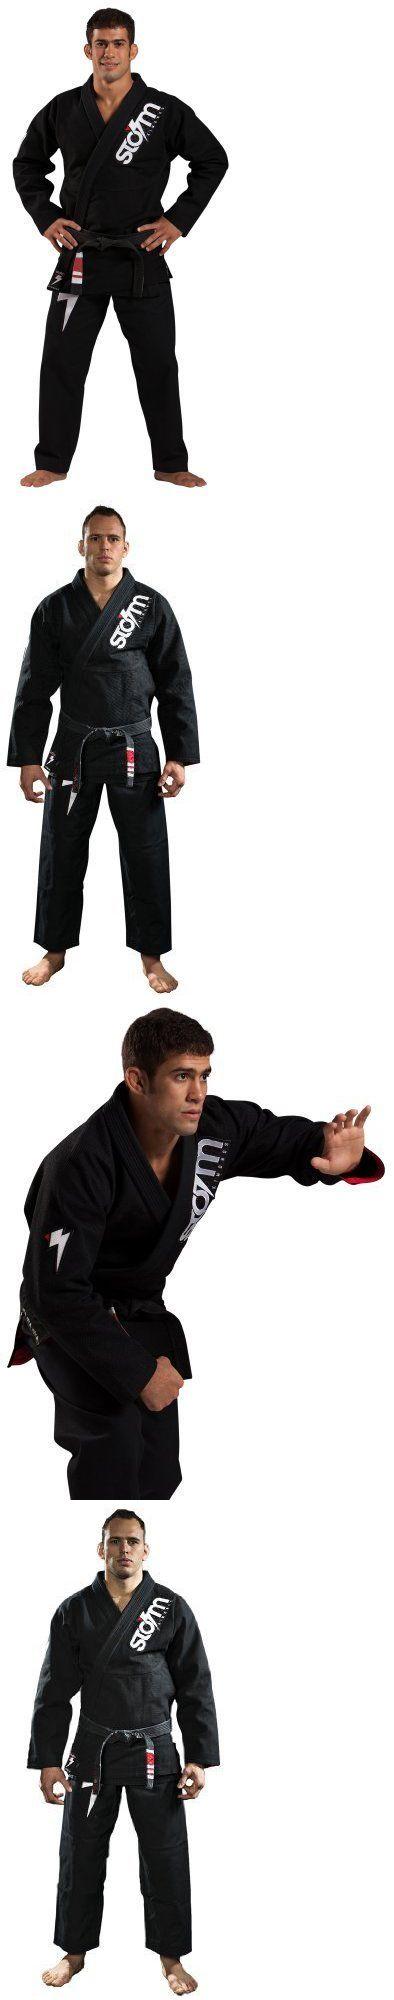 Jackets 179771: Storm Kimonos Trooper Gi Black A3 Mens Martial Arts Uniform Jacket, New -> BUY IT NOW ONLY: $185.91 on eBay!